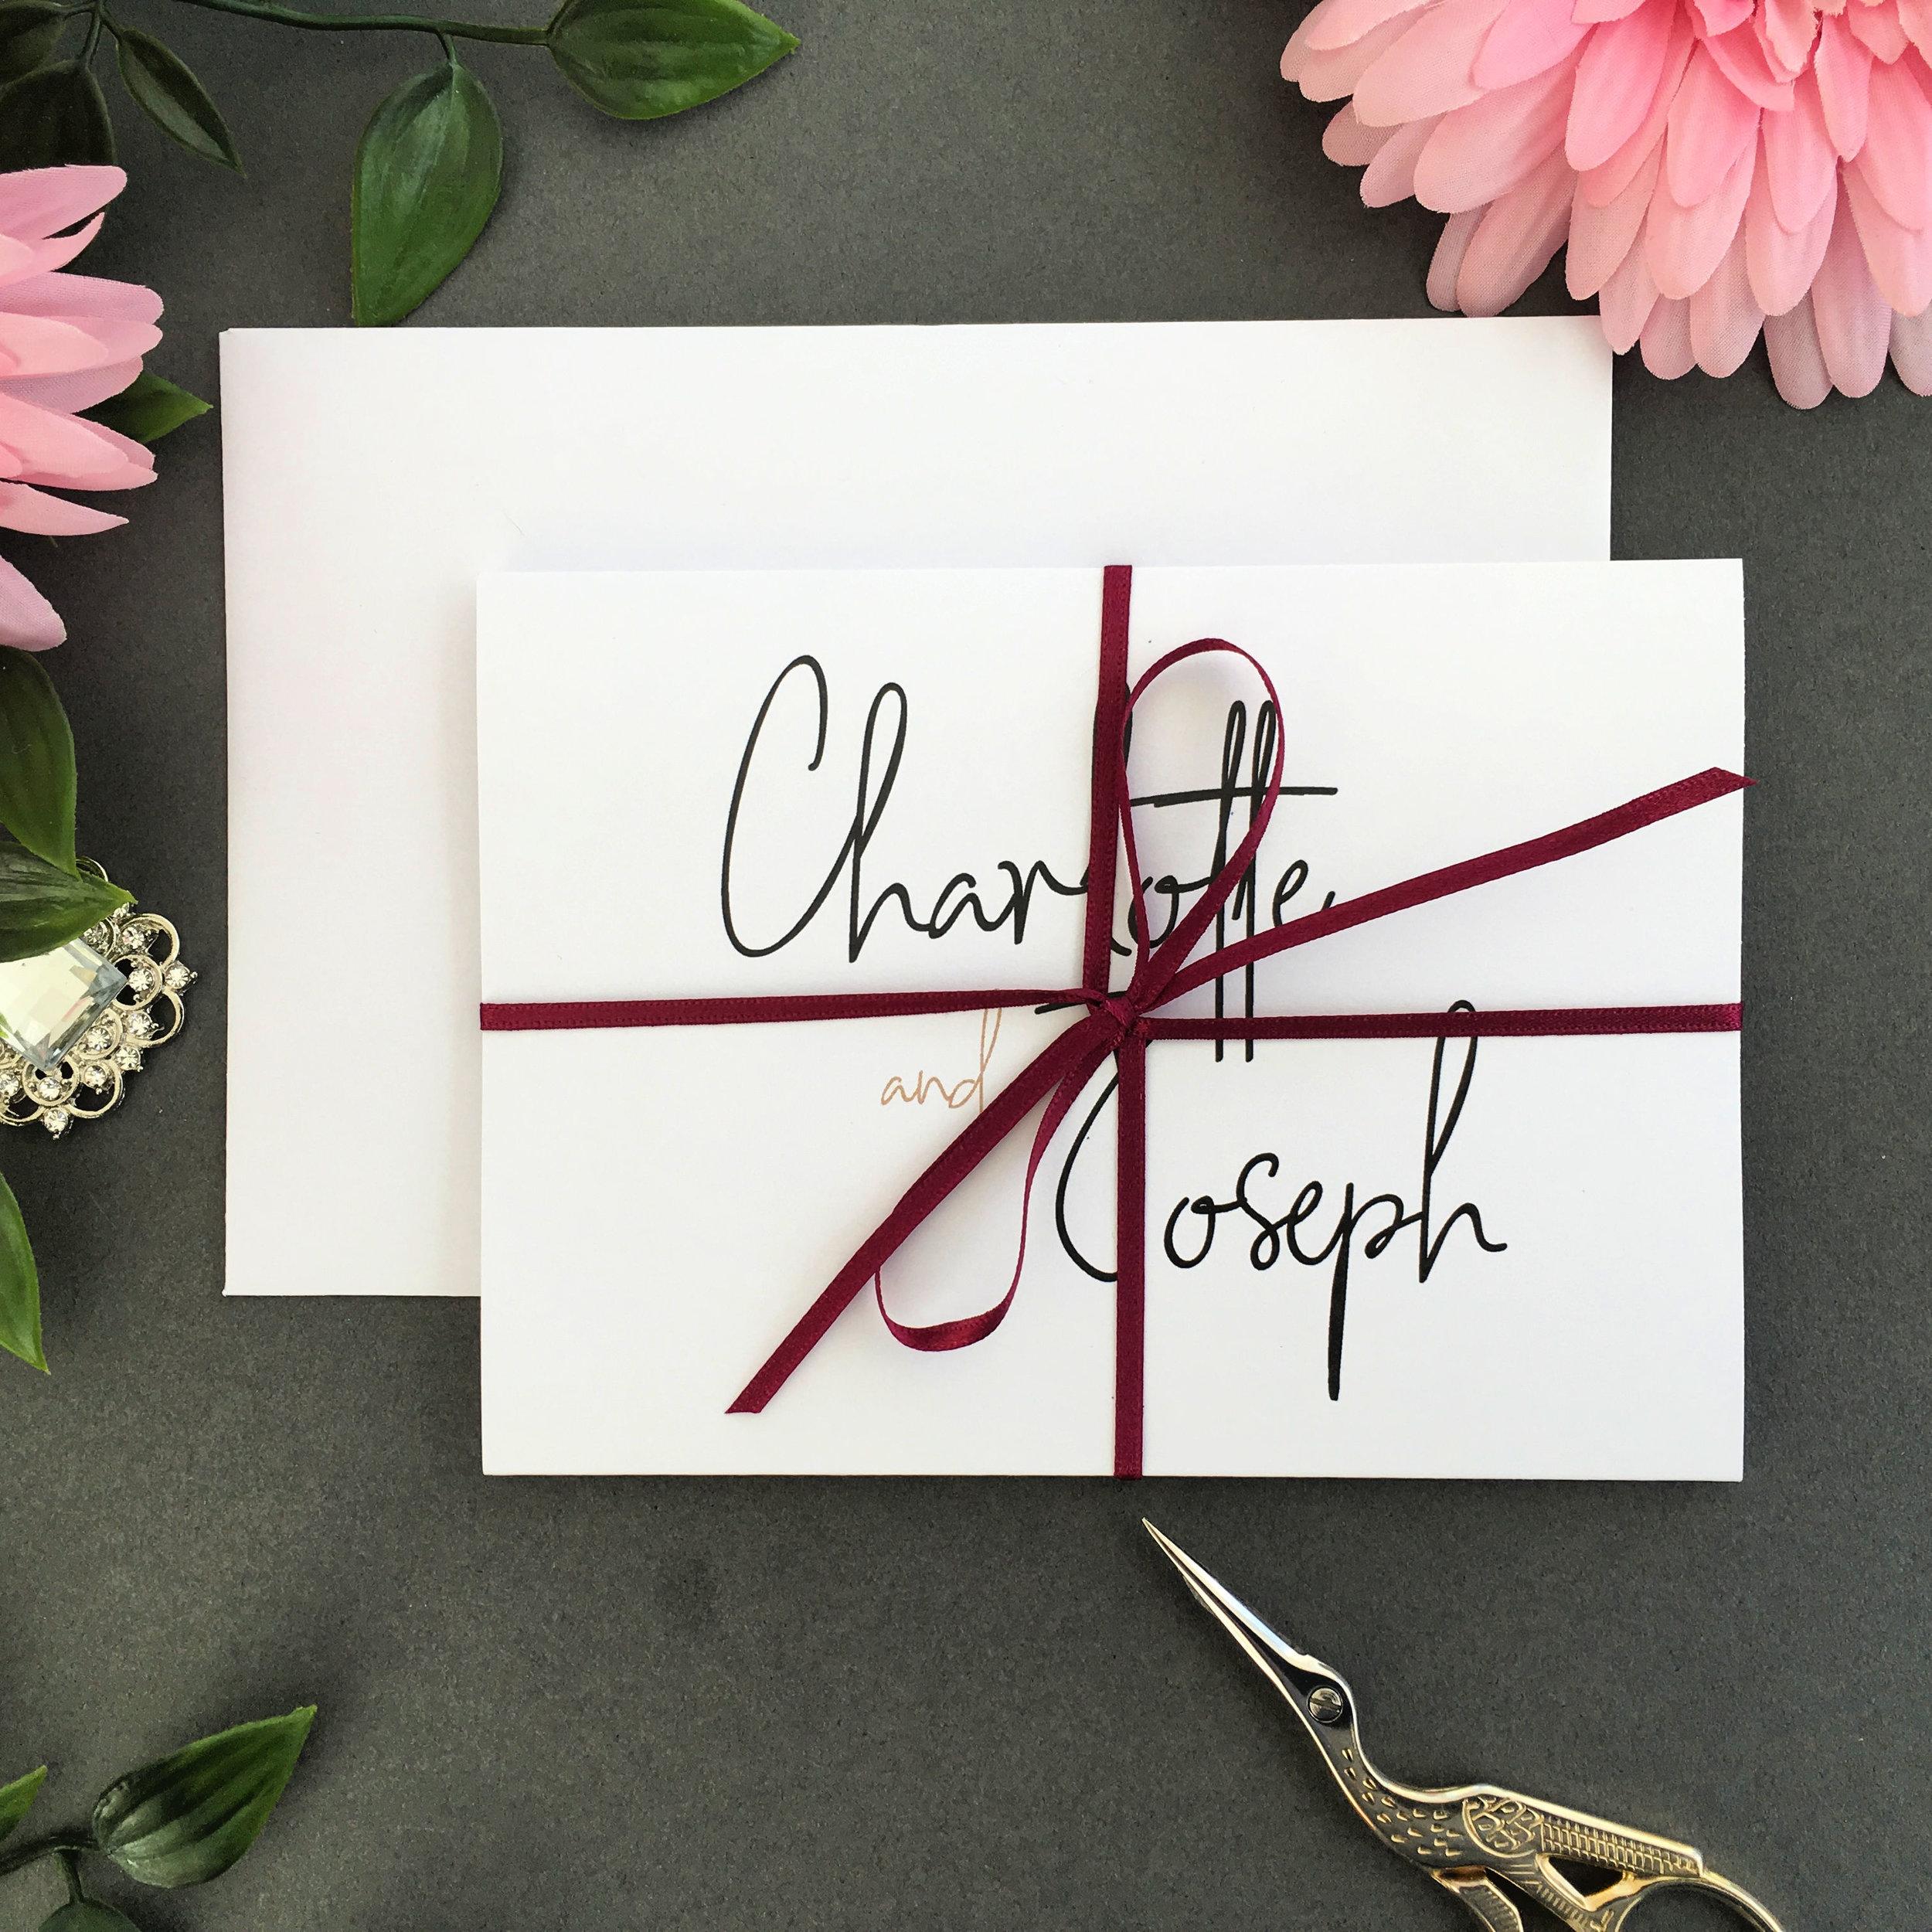 Chancery Lane concertina invitation shown with Burgundy ribbon tie